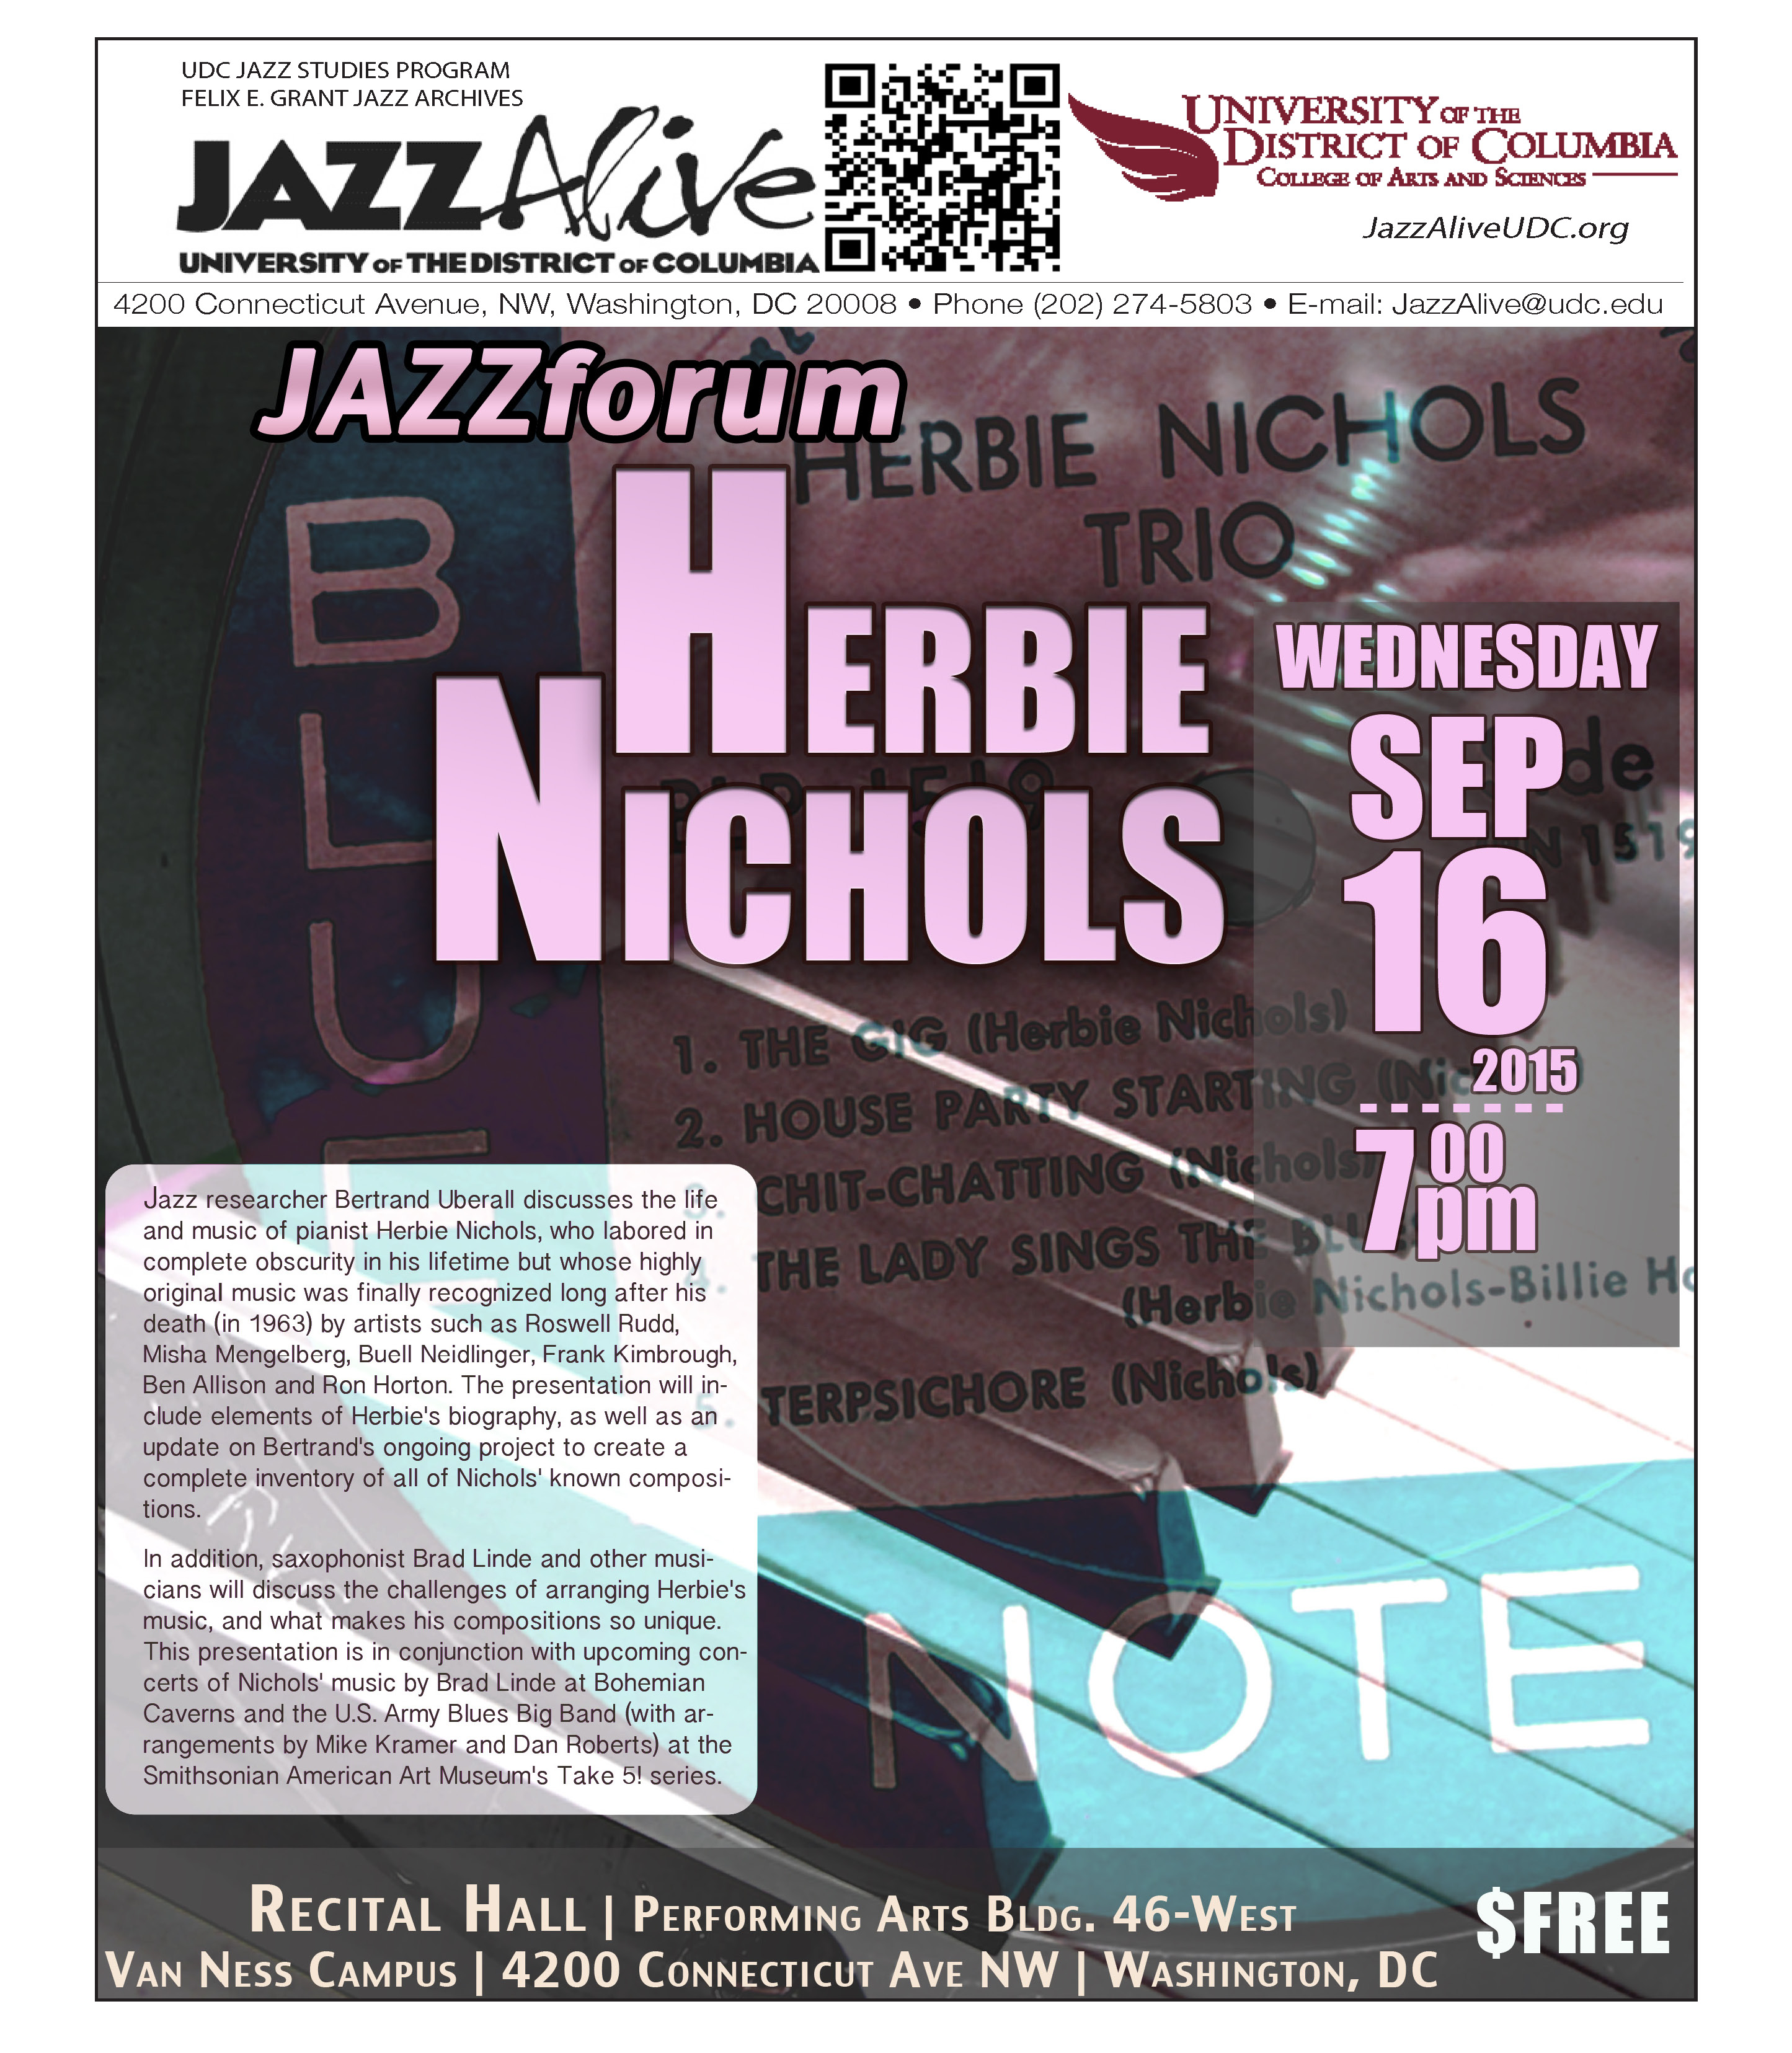 JAZZforum: Herbie Nichols